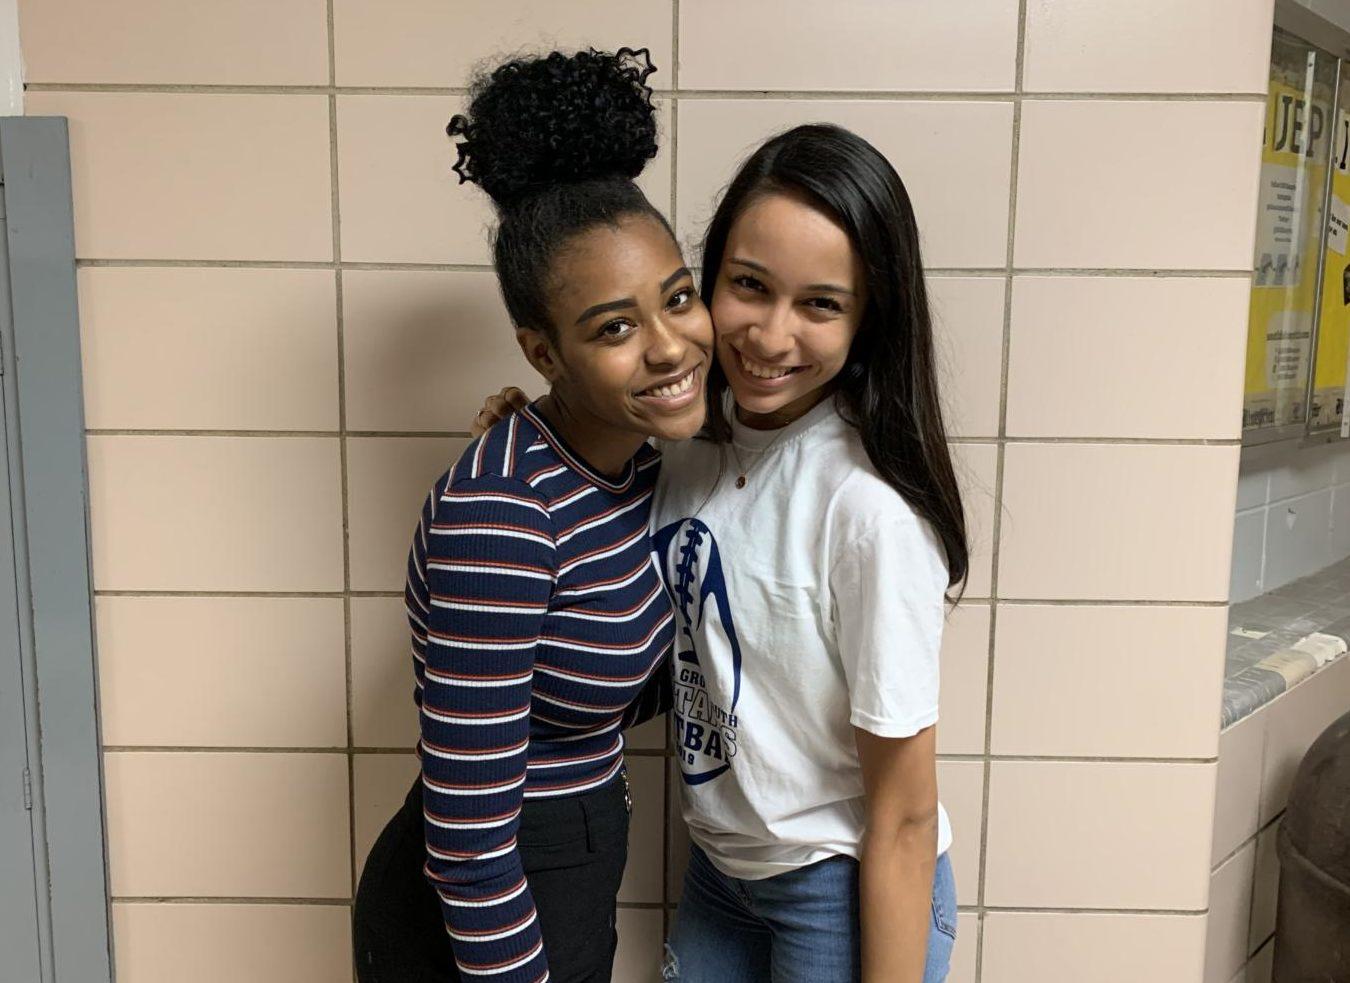 Juniors Arielle Williams and Jimena Gomez met in Avid freshman year.